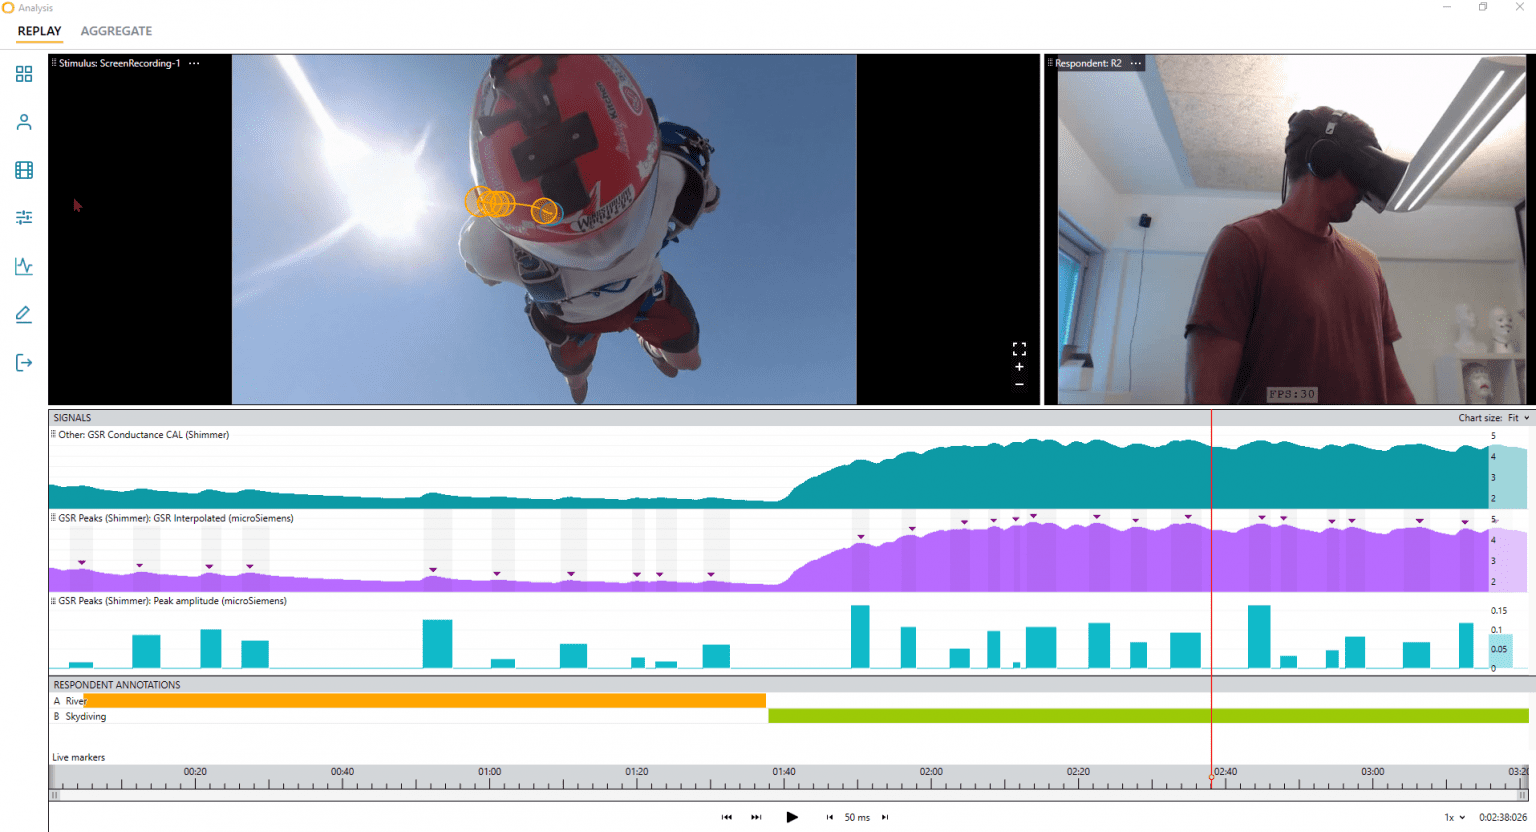 Skydiver - Multimodality